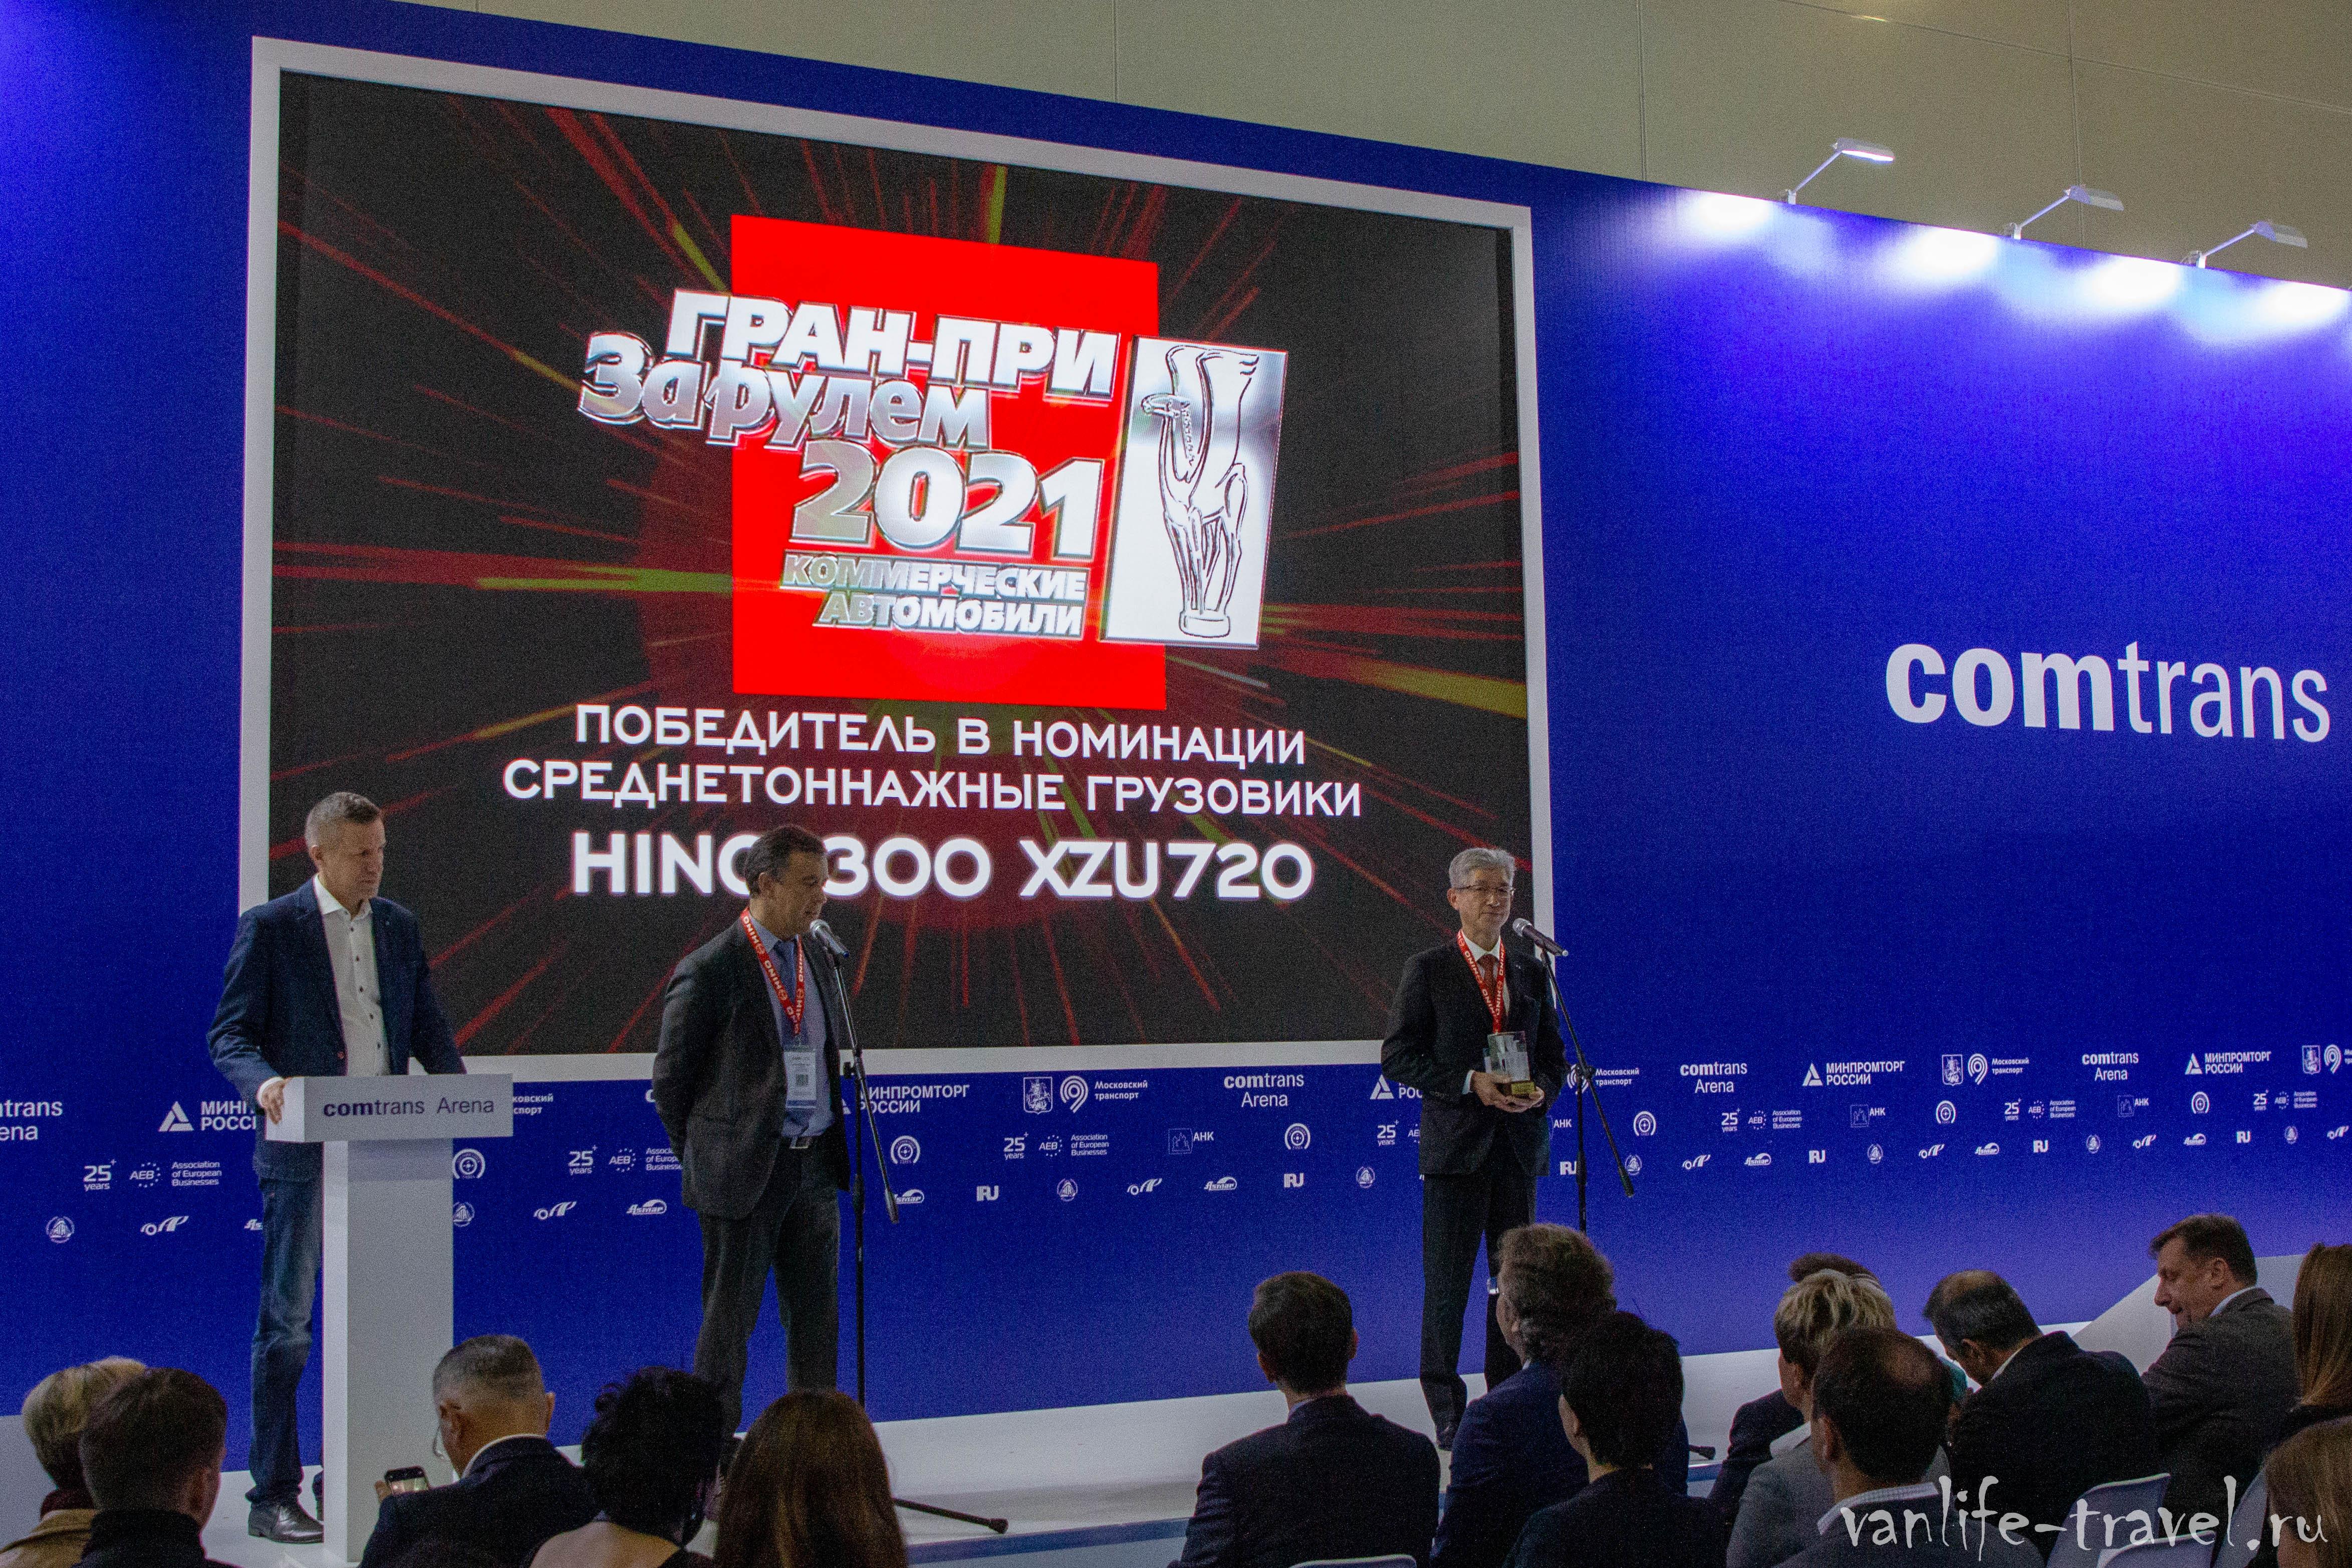 gran-pri-za-rulem-2021-hino-300